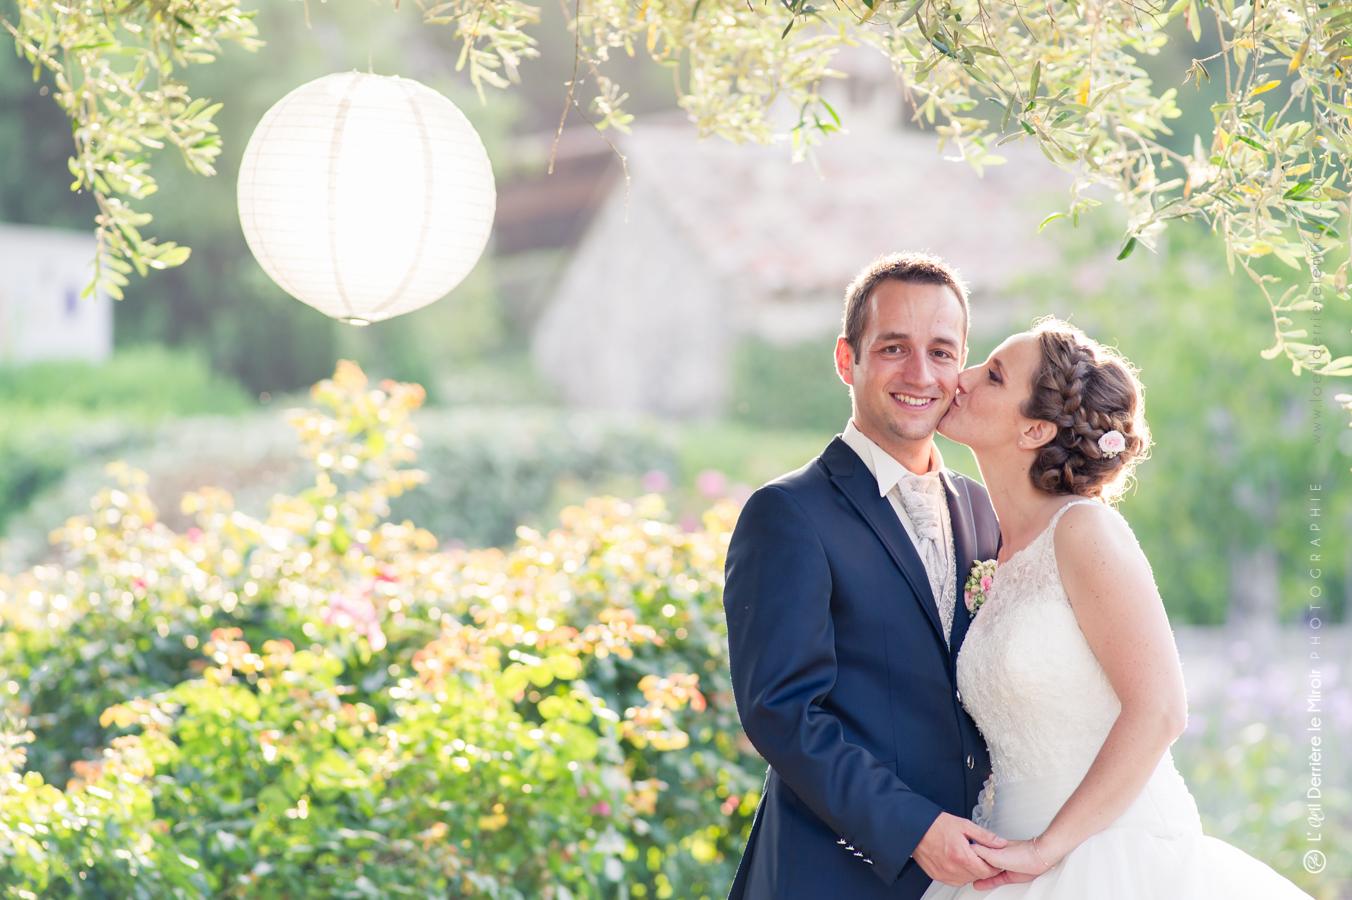 mariage-cj-vaugrenier-loeilderrierelemiroir-060